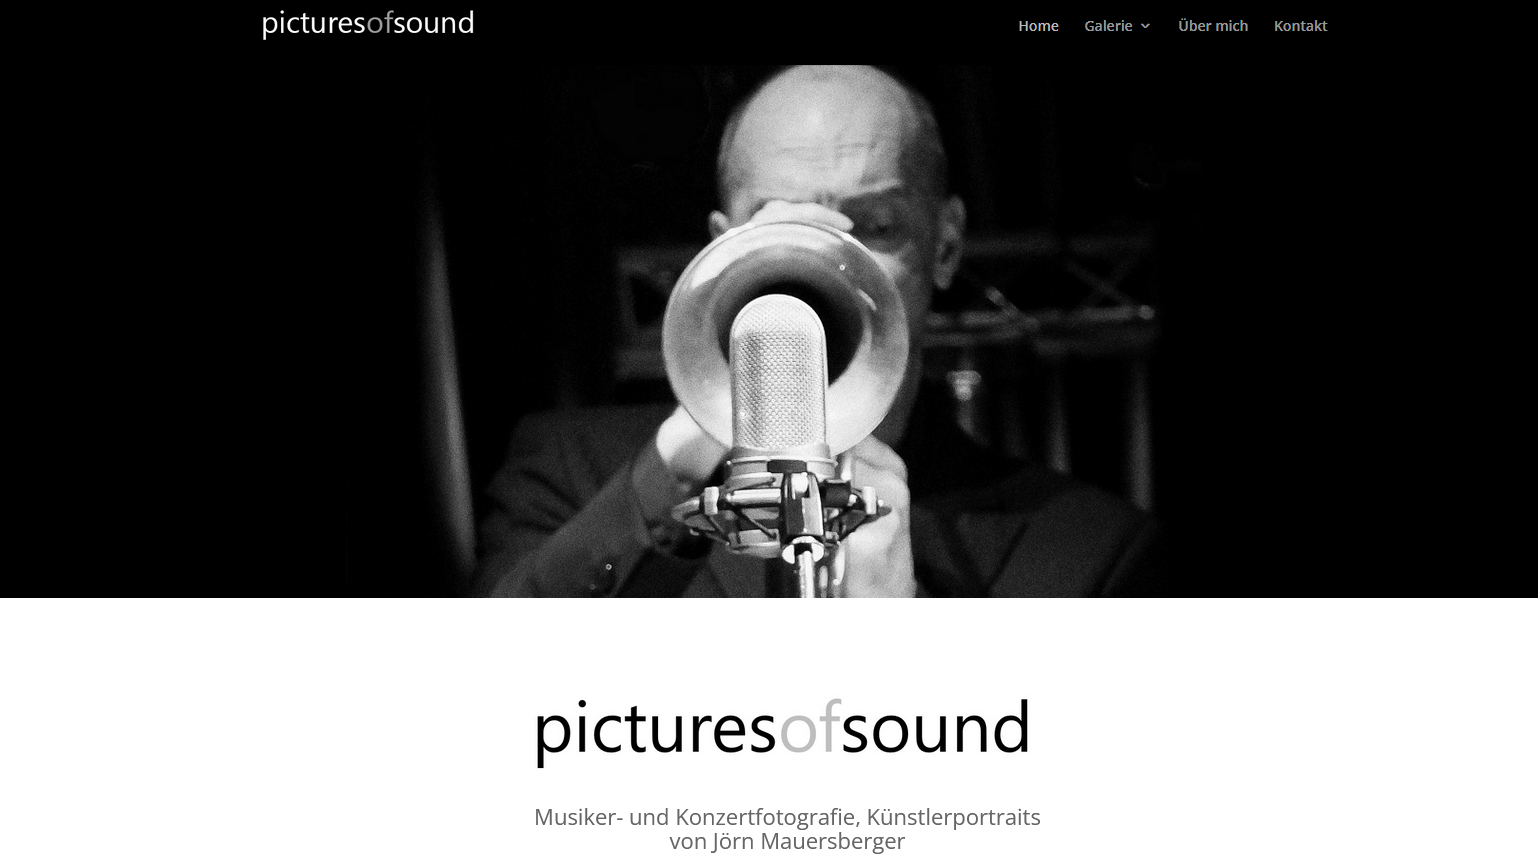 PicturesofSound